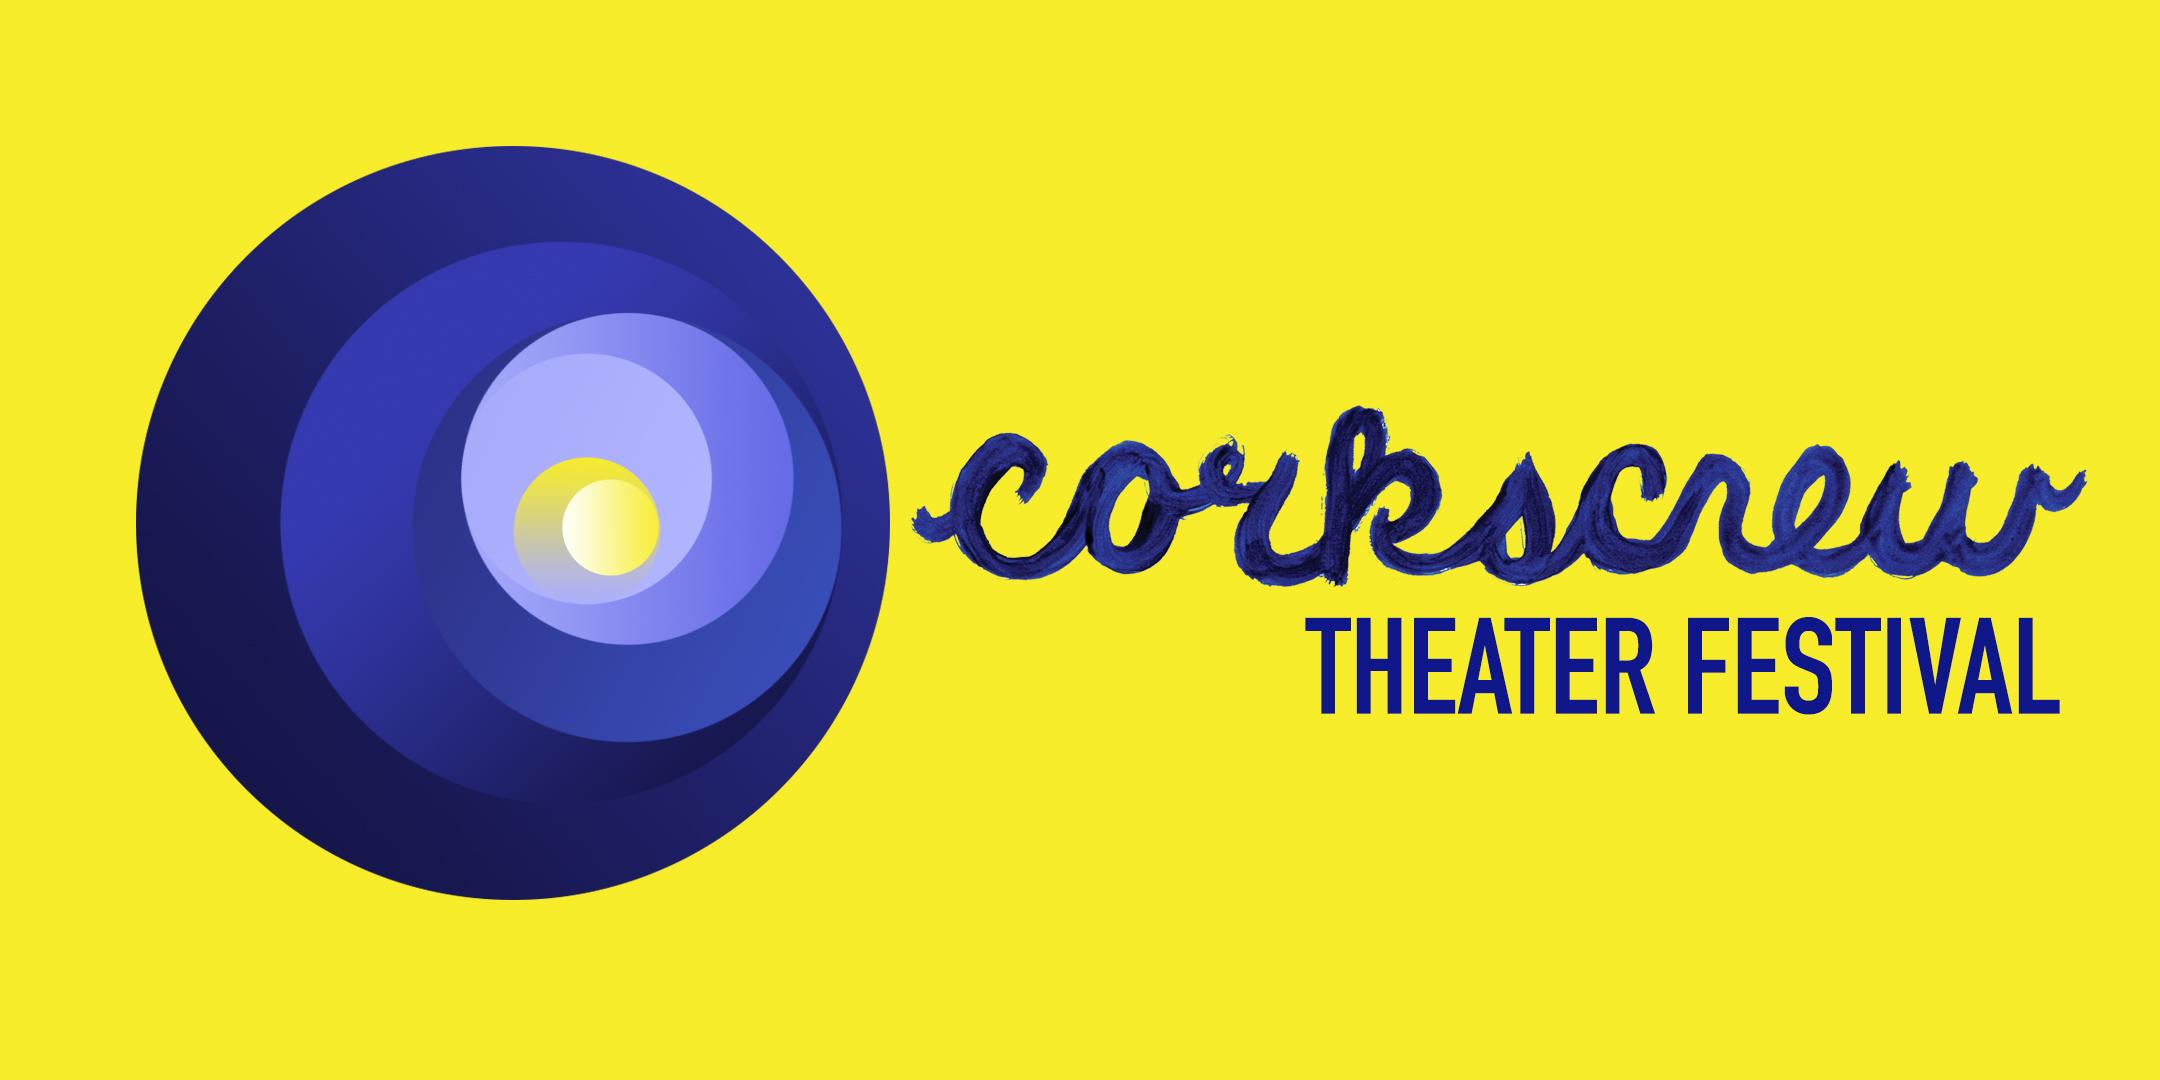 corkscrewfestival.org